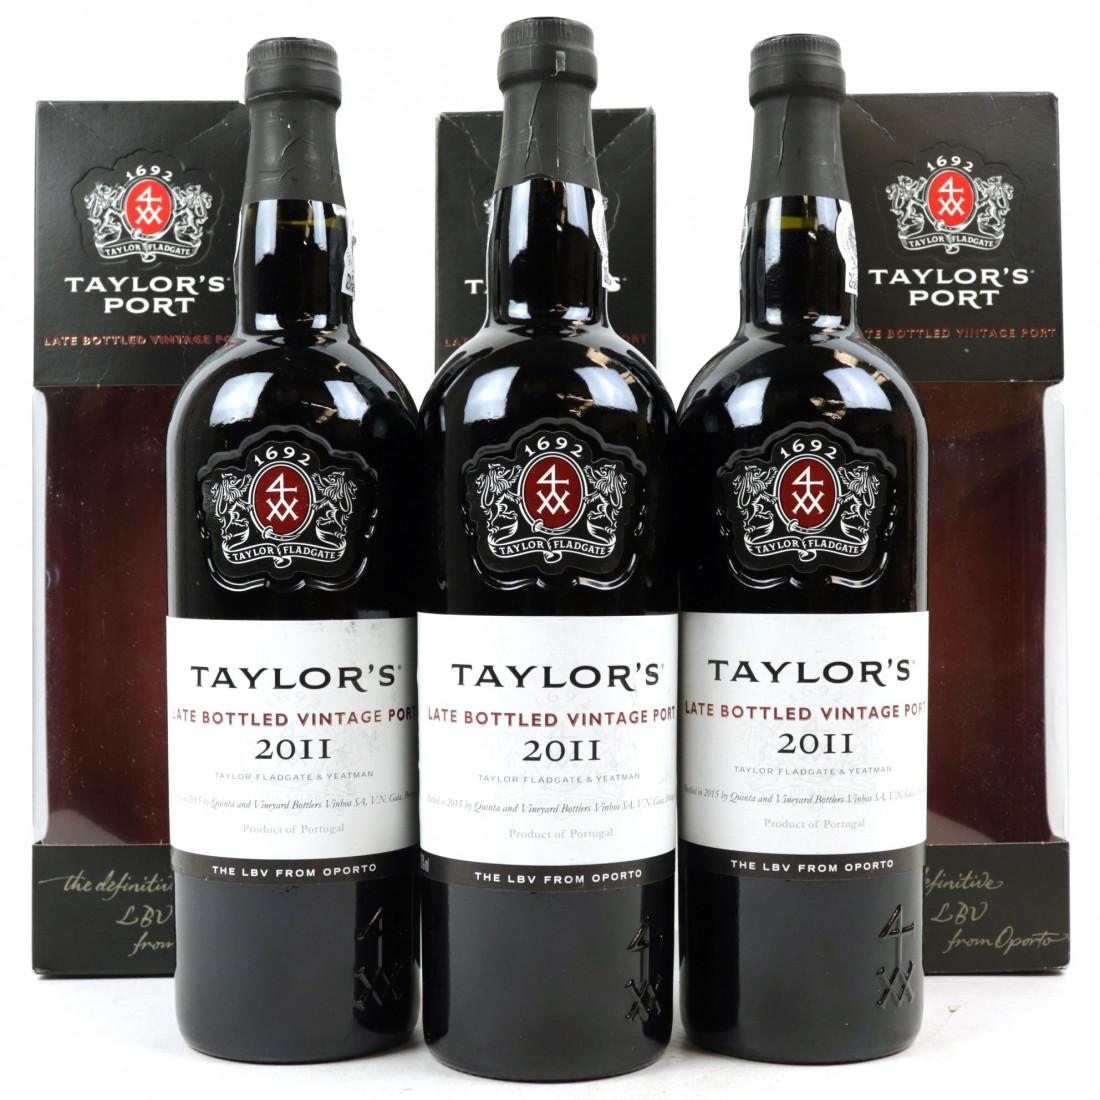 Taylors 2011 LBV Port 3x75cl